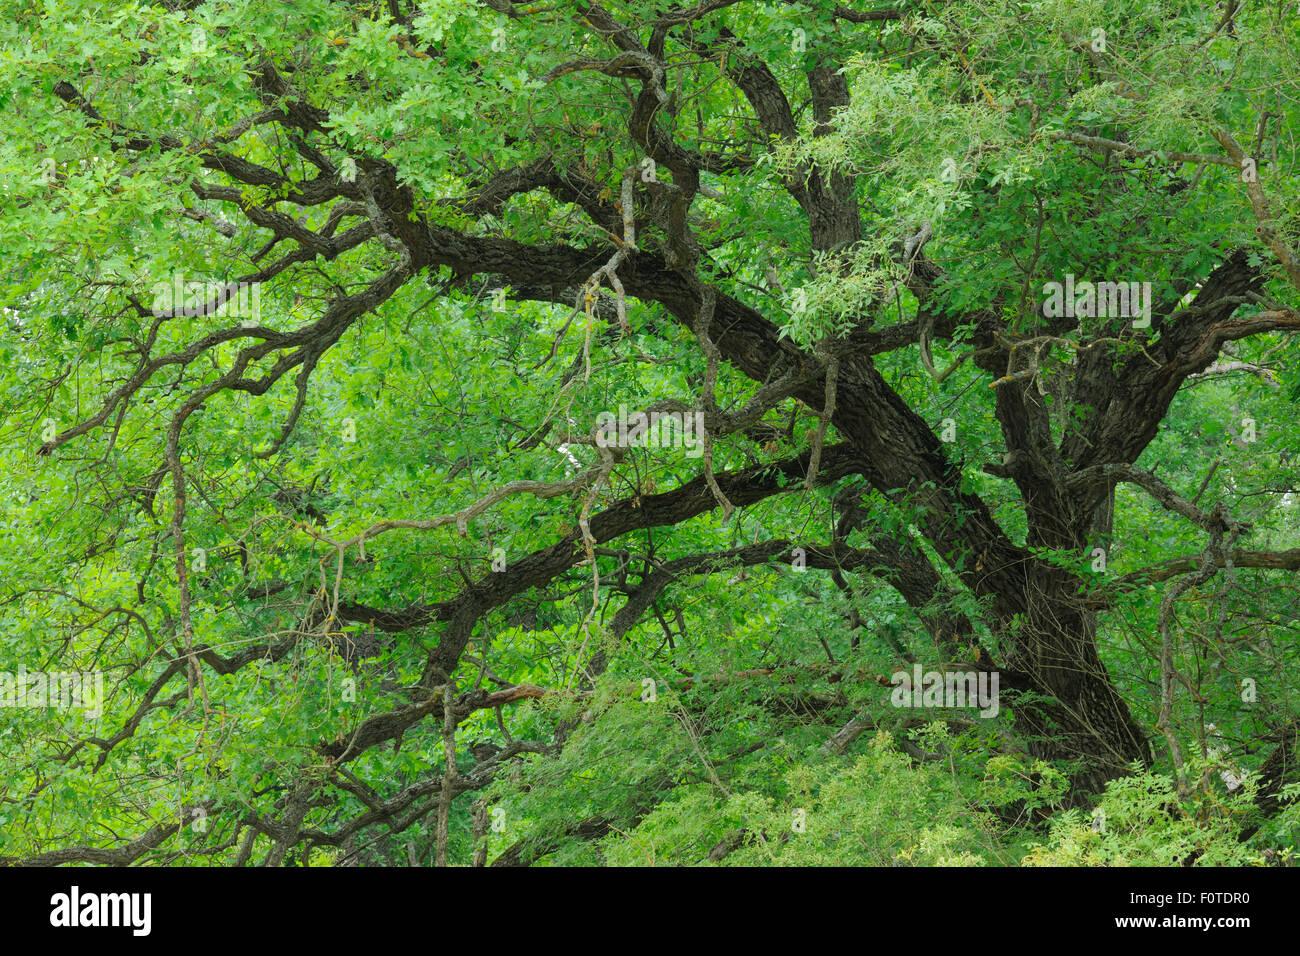 Oak (Quercus robur) Letea forest, Strictly protected nature reserve, Danube delta rewilding area, Romania - Stock Image